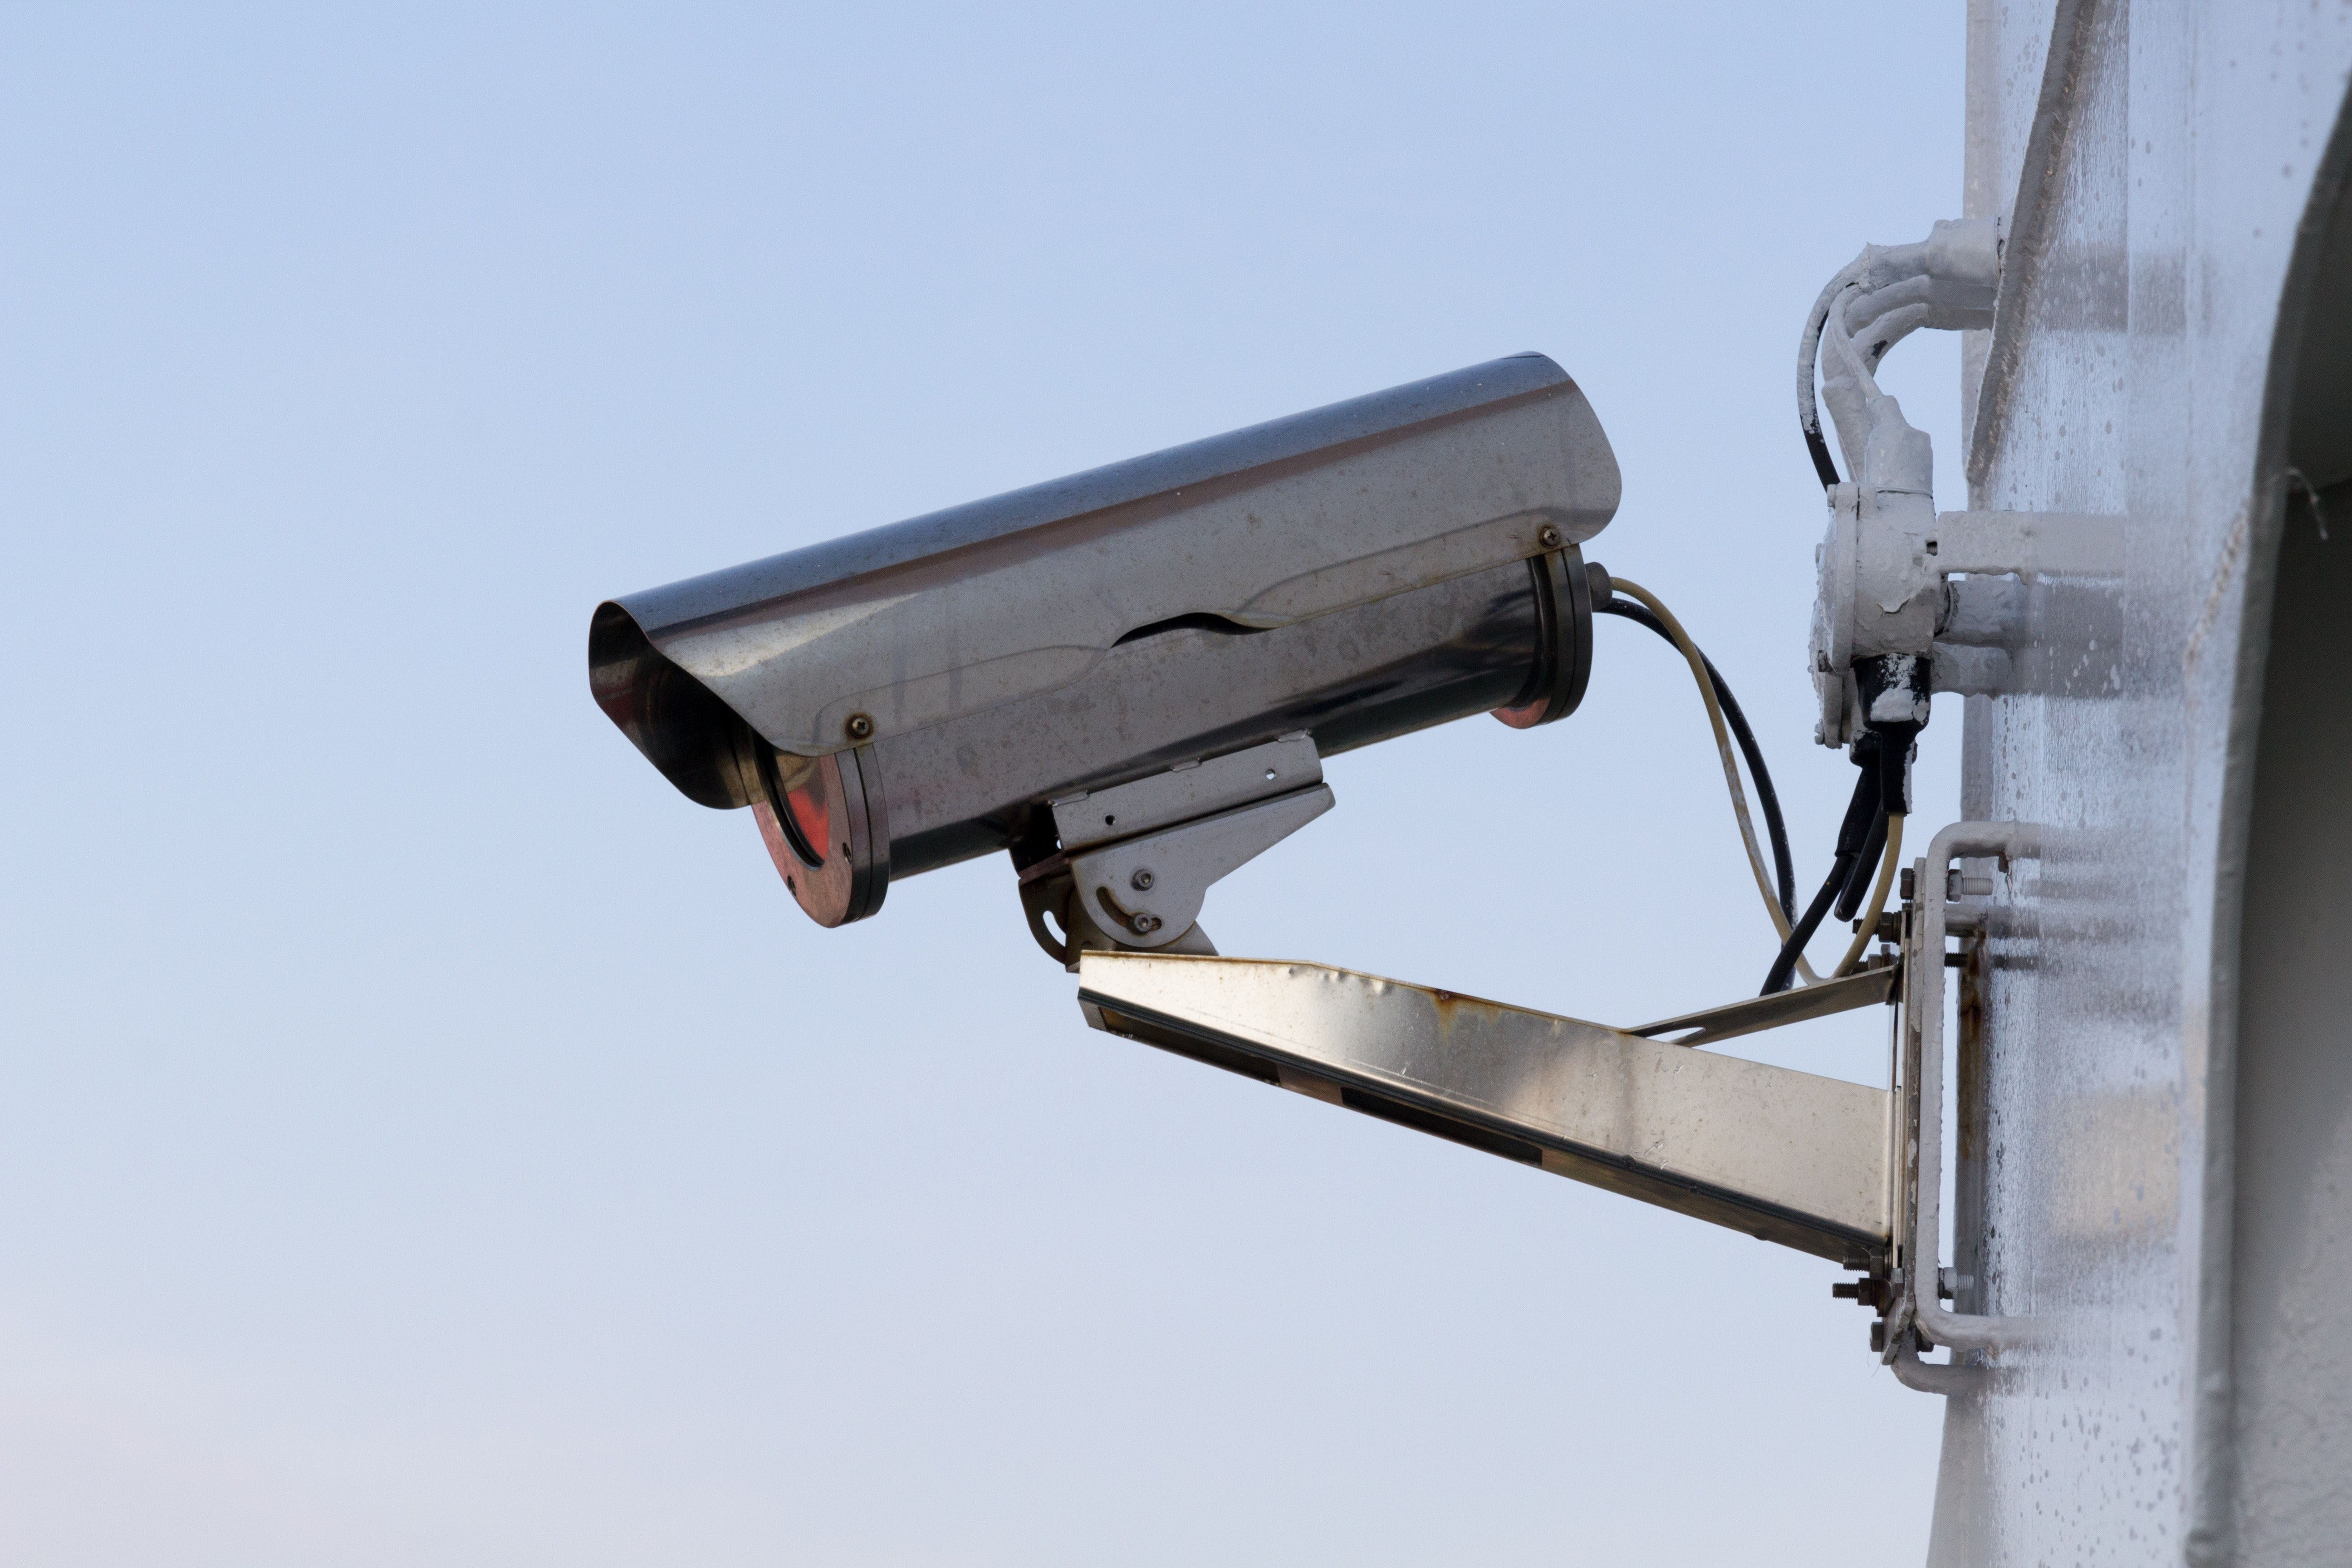 Ipixo Outdoor Security Camera Security Cameras For Home Outdoor Security Camera Home Security Systems